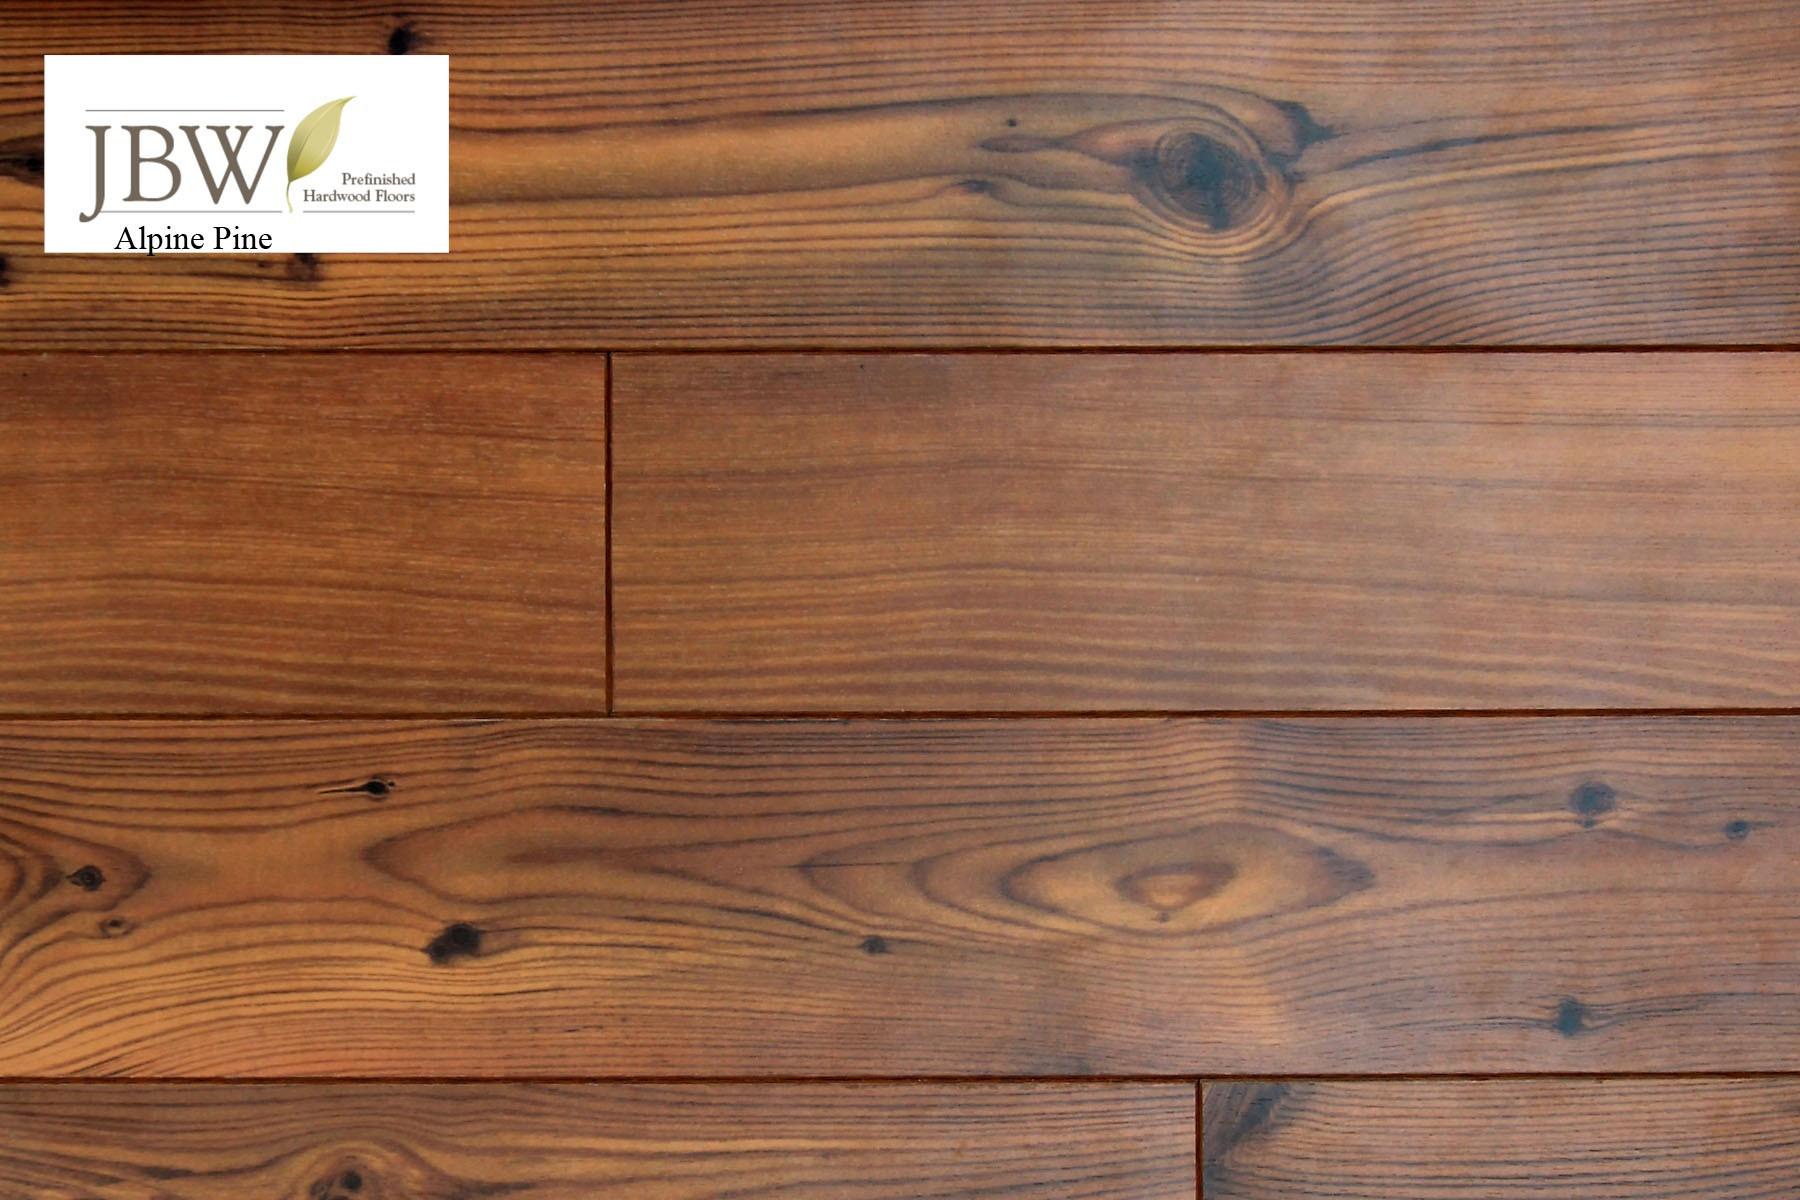 prefinished hardwood flooring for sale of hardwood flooring vs engineered monterey hardwood collection in hardwood flooring vs engineered hardwood floor vs laminate awesome vinyl plank wood look floor